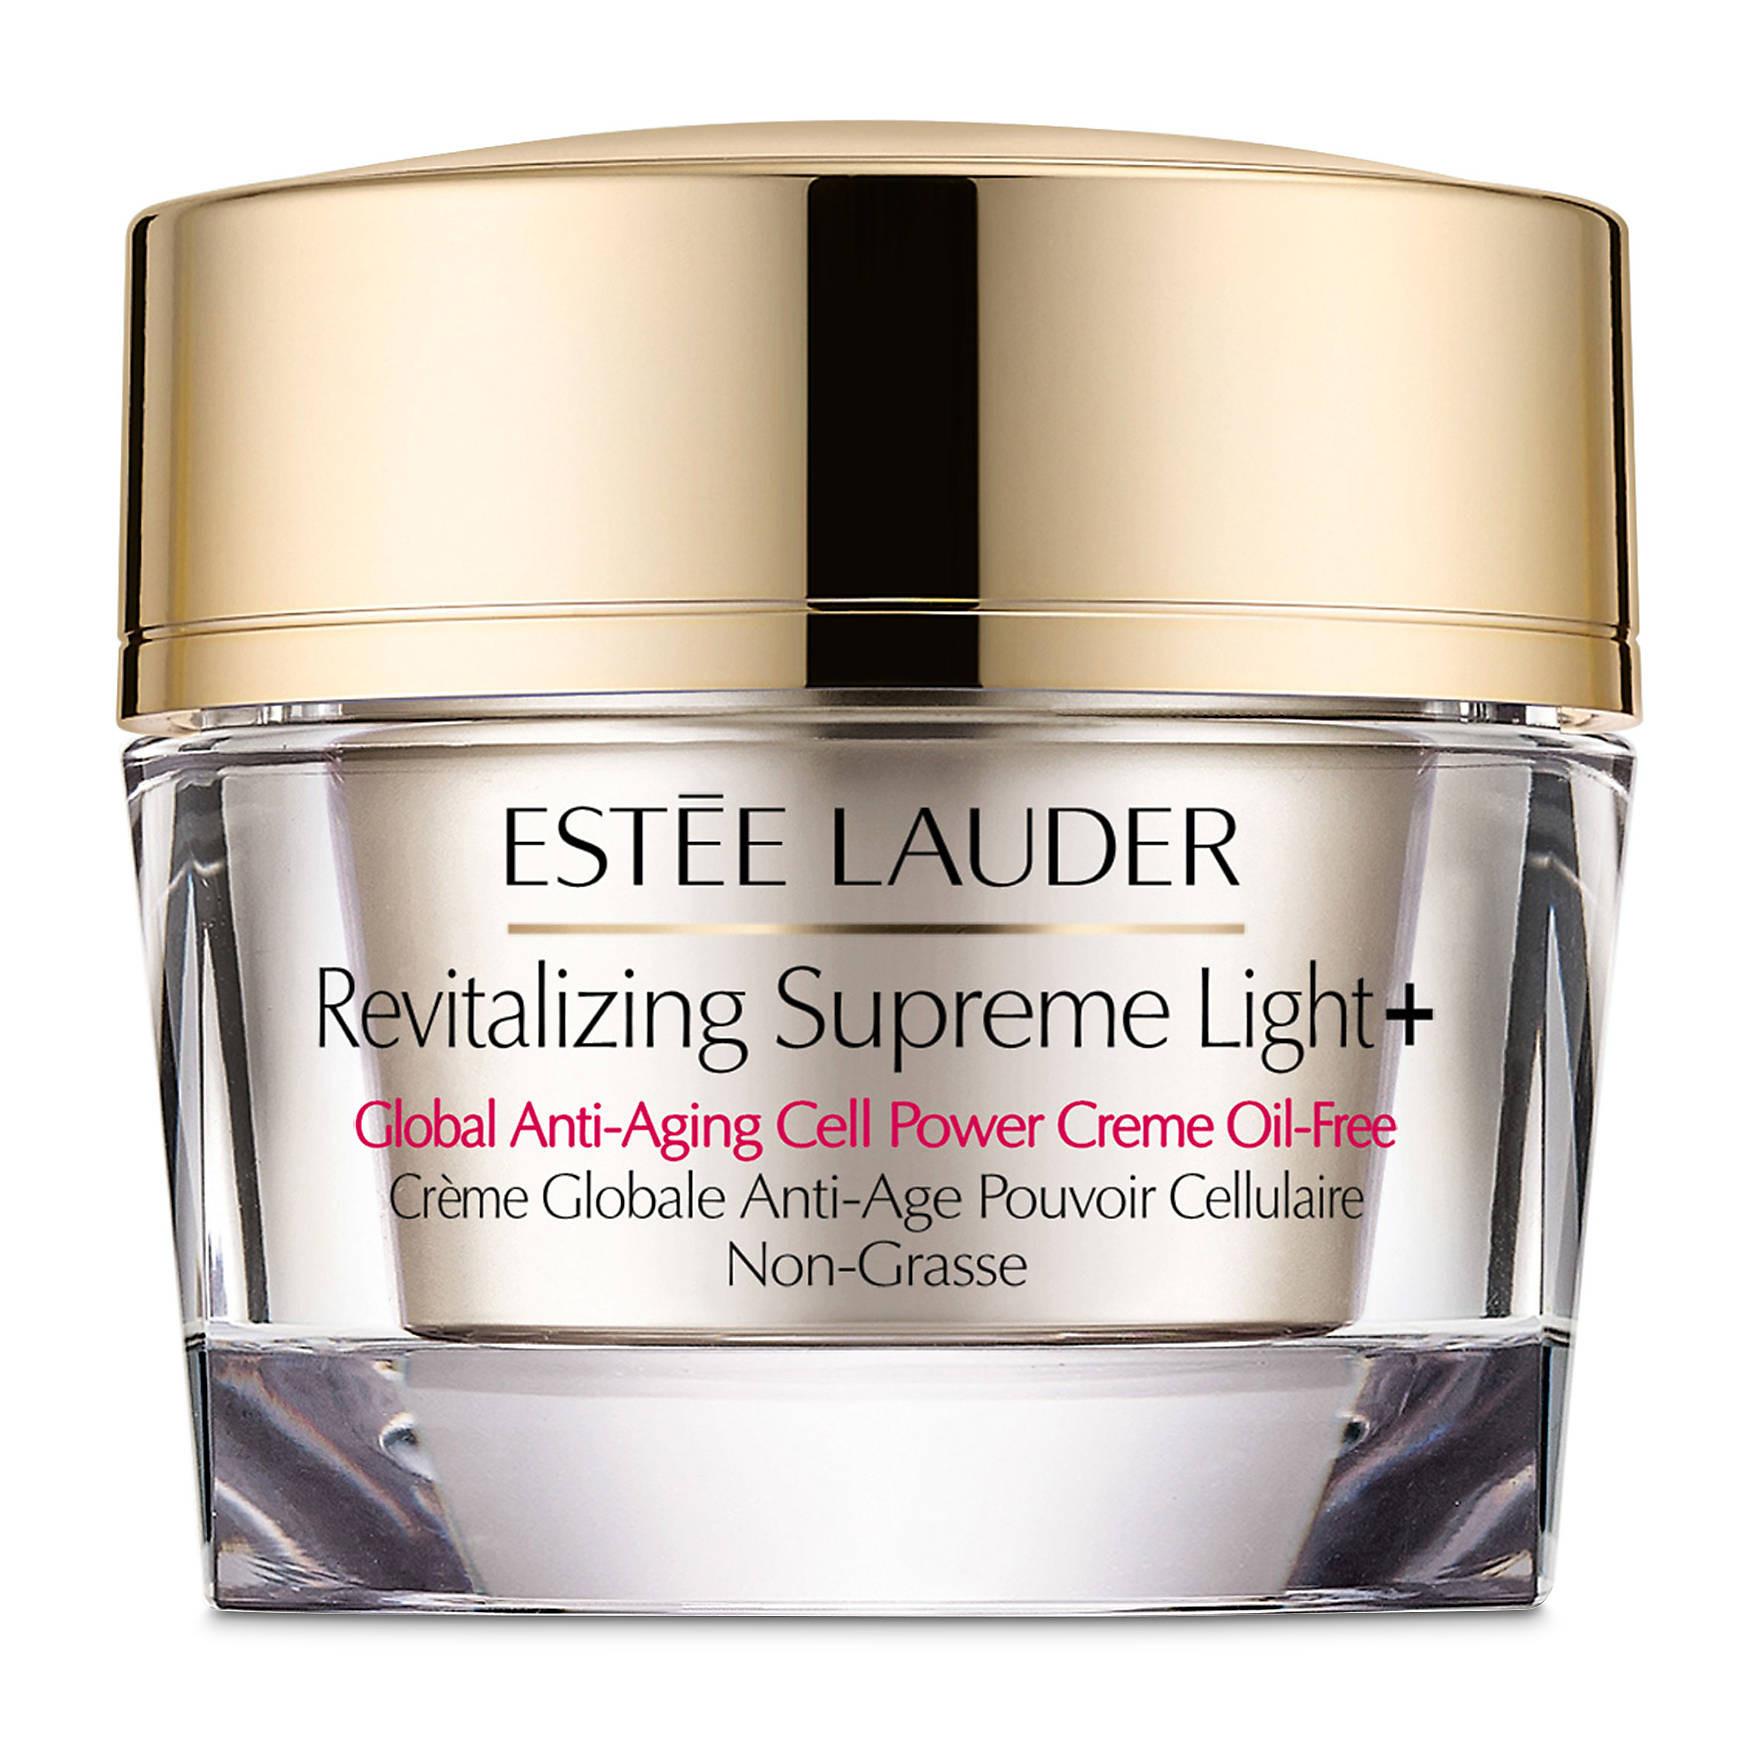 Estée Lauder Revitalizing Supreme Light+ Global Anti-Aging Cell Power Creme Oil-Free